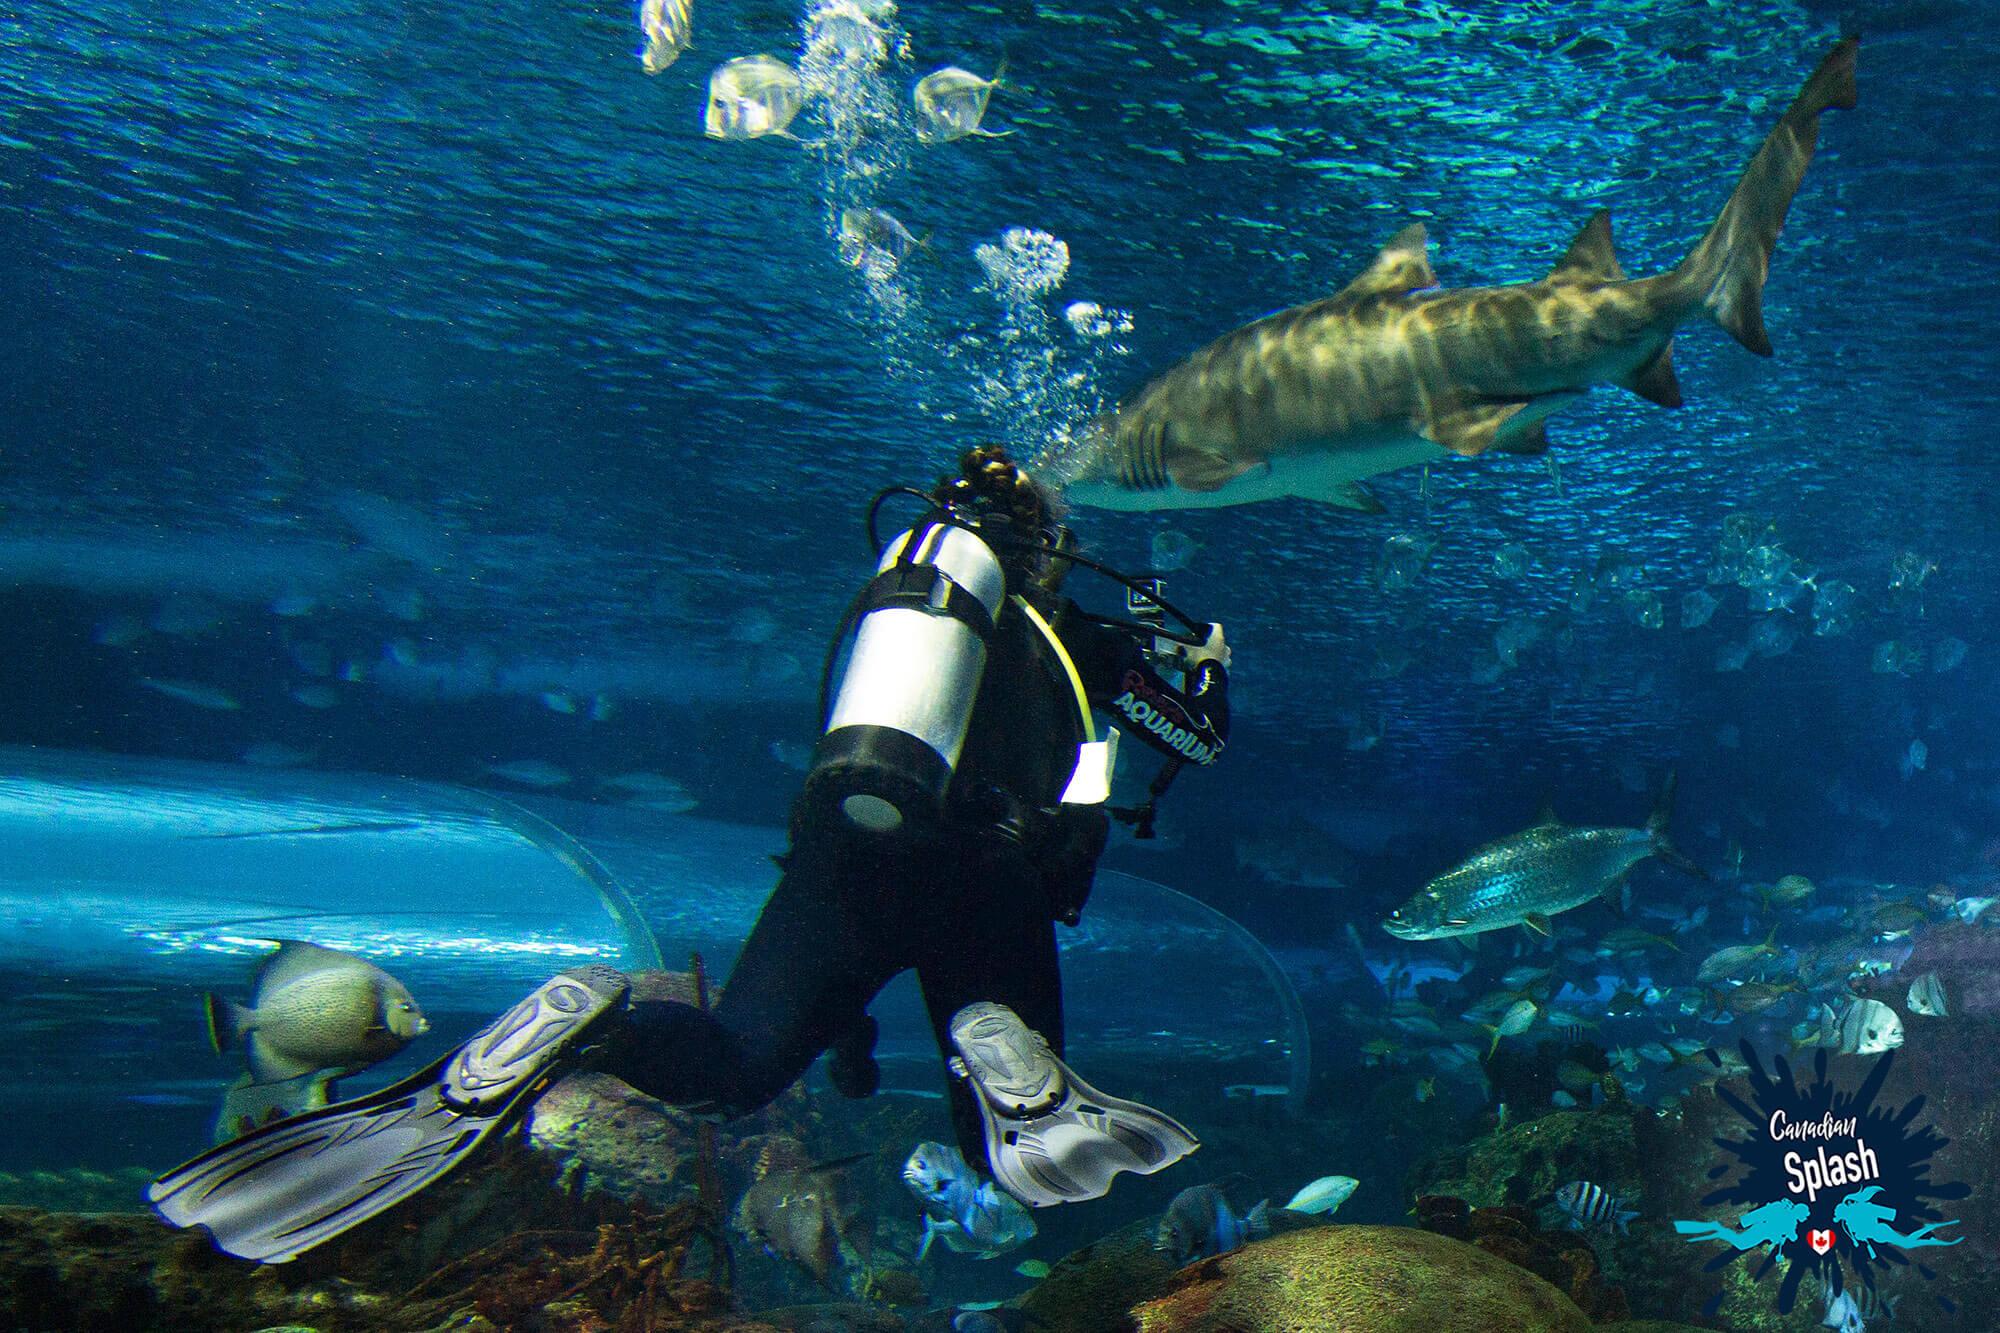 Ali Filming A Shark In The Dangerous Lagoon Tank At Ripley's Aquarium Of Canada, Ontario Scuba Diving, Canada